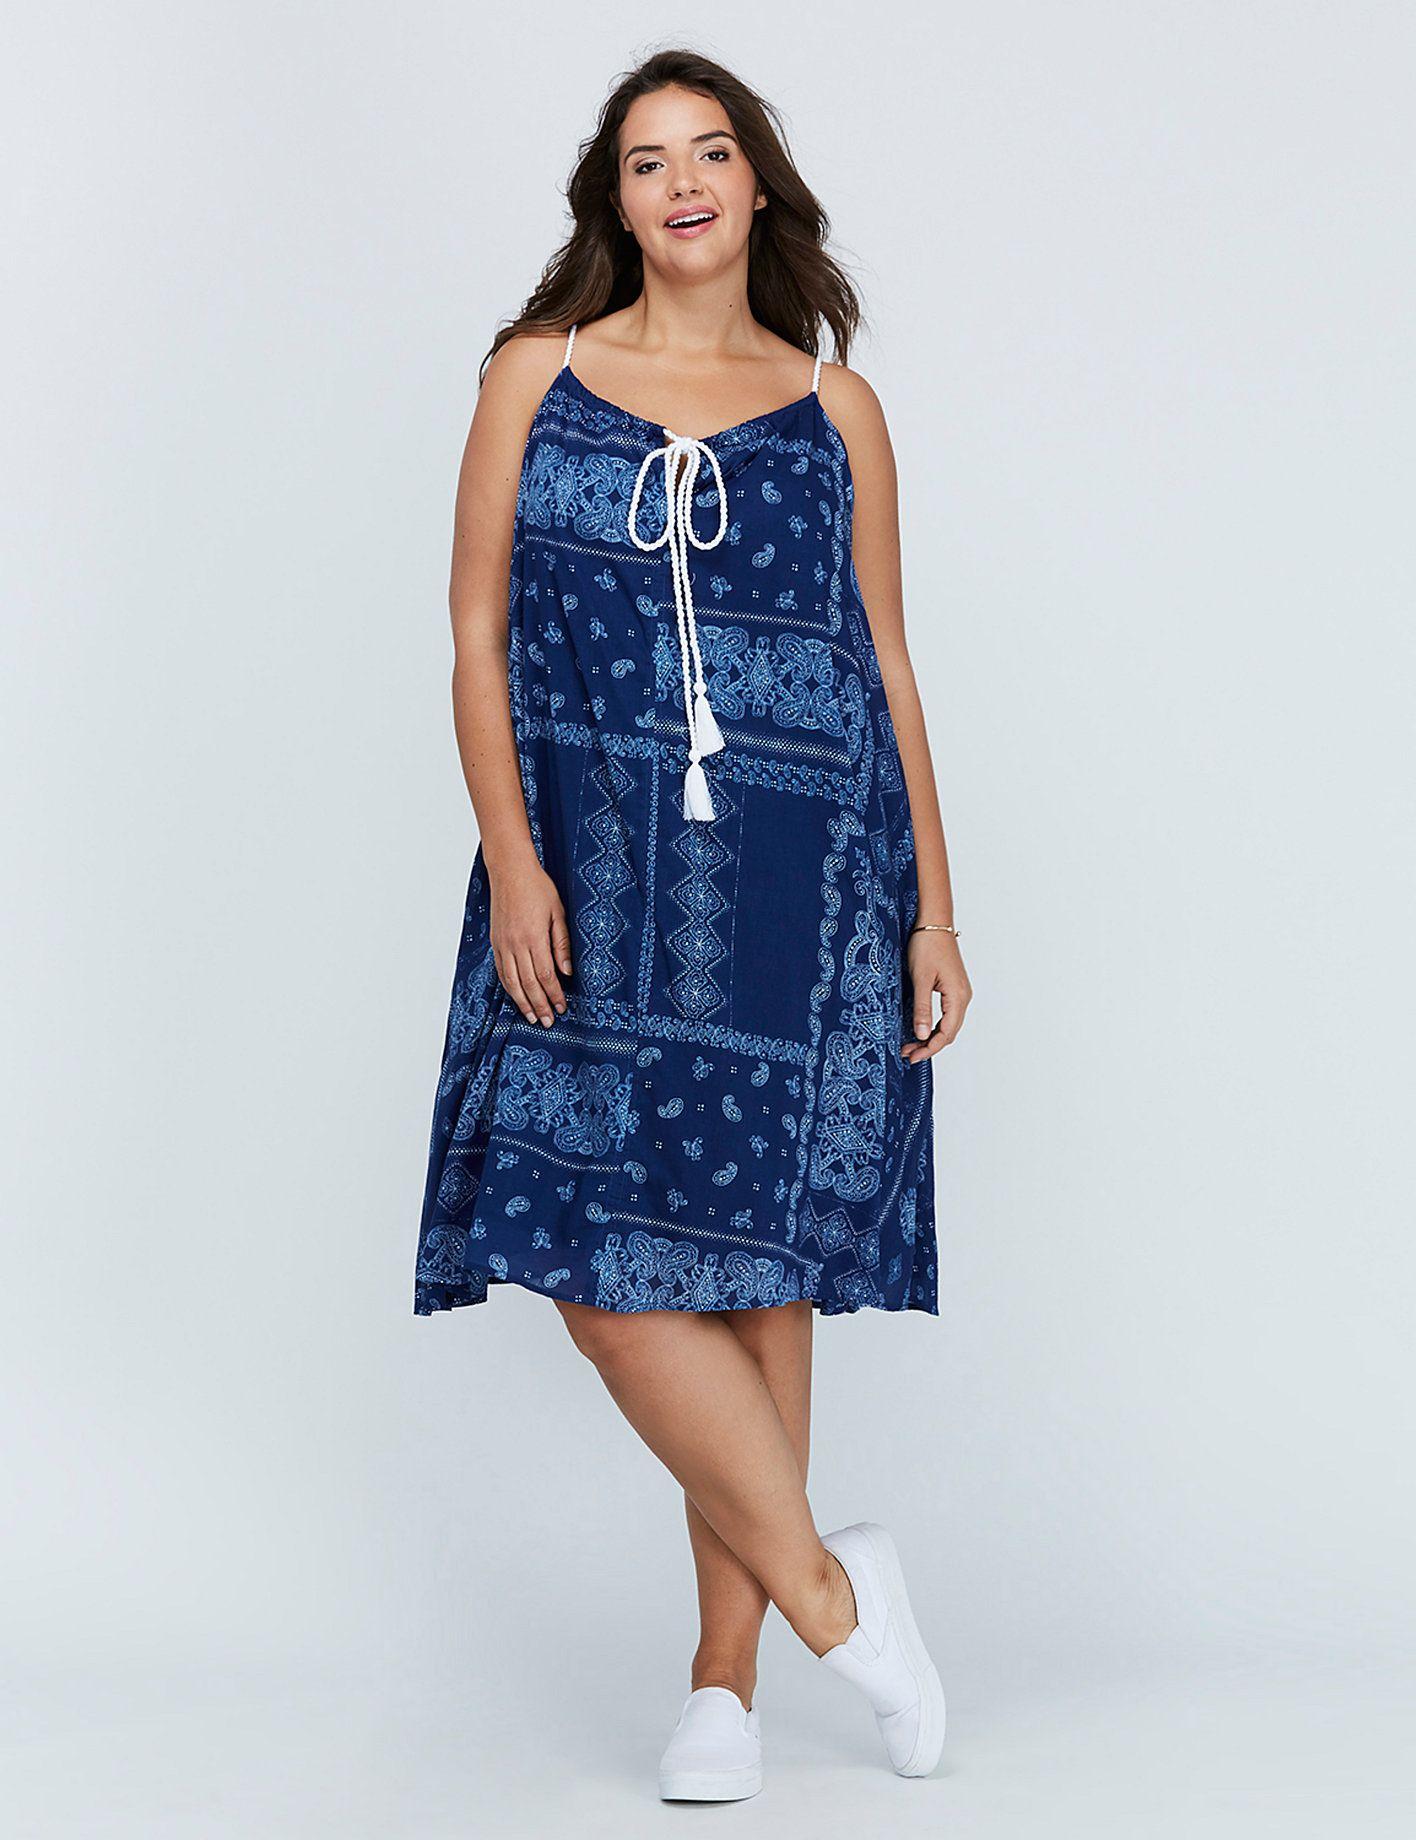 Lane bryant dresses plus sizes